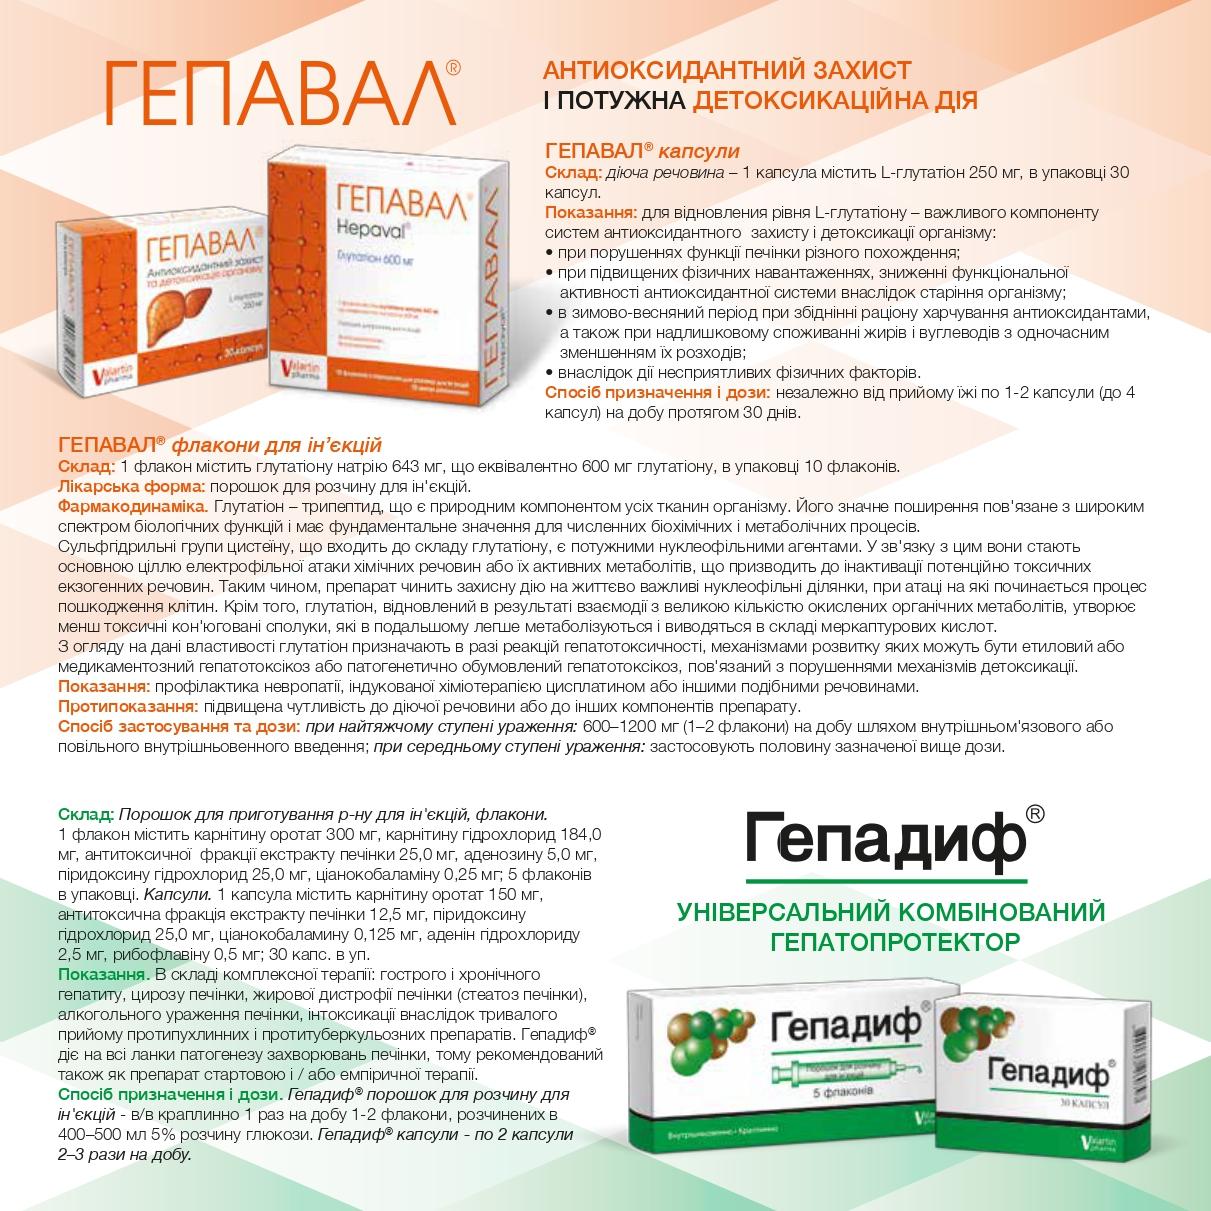 общии_ буклет205x205 2019_page-0002